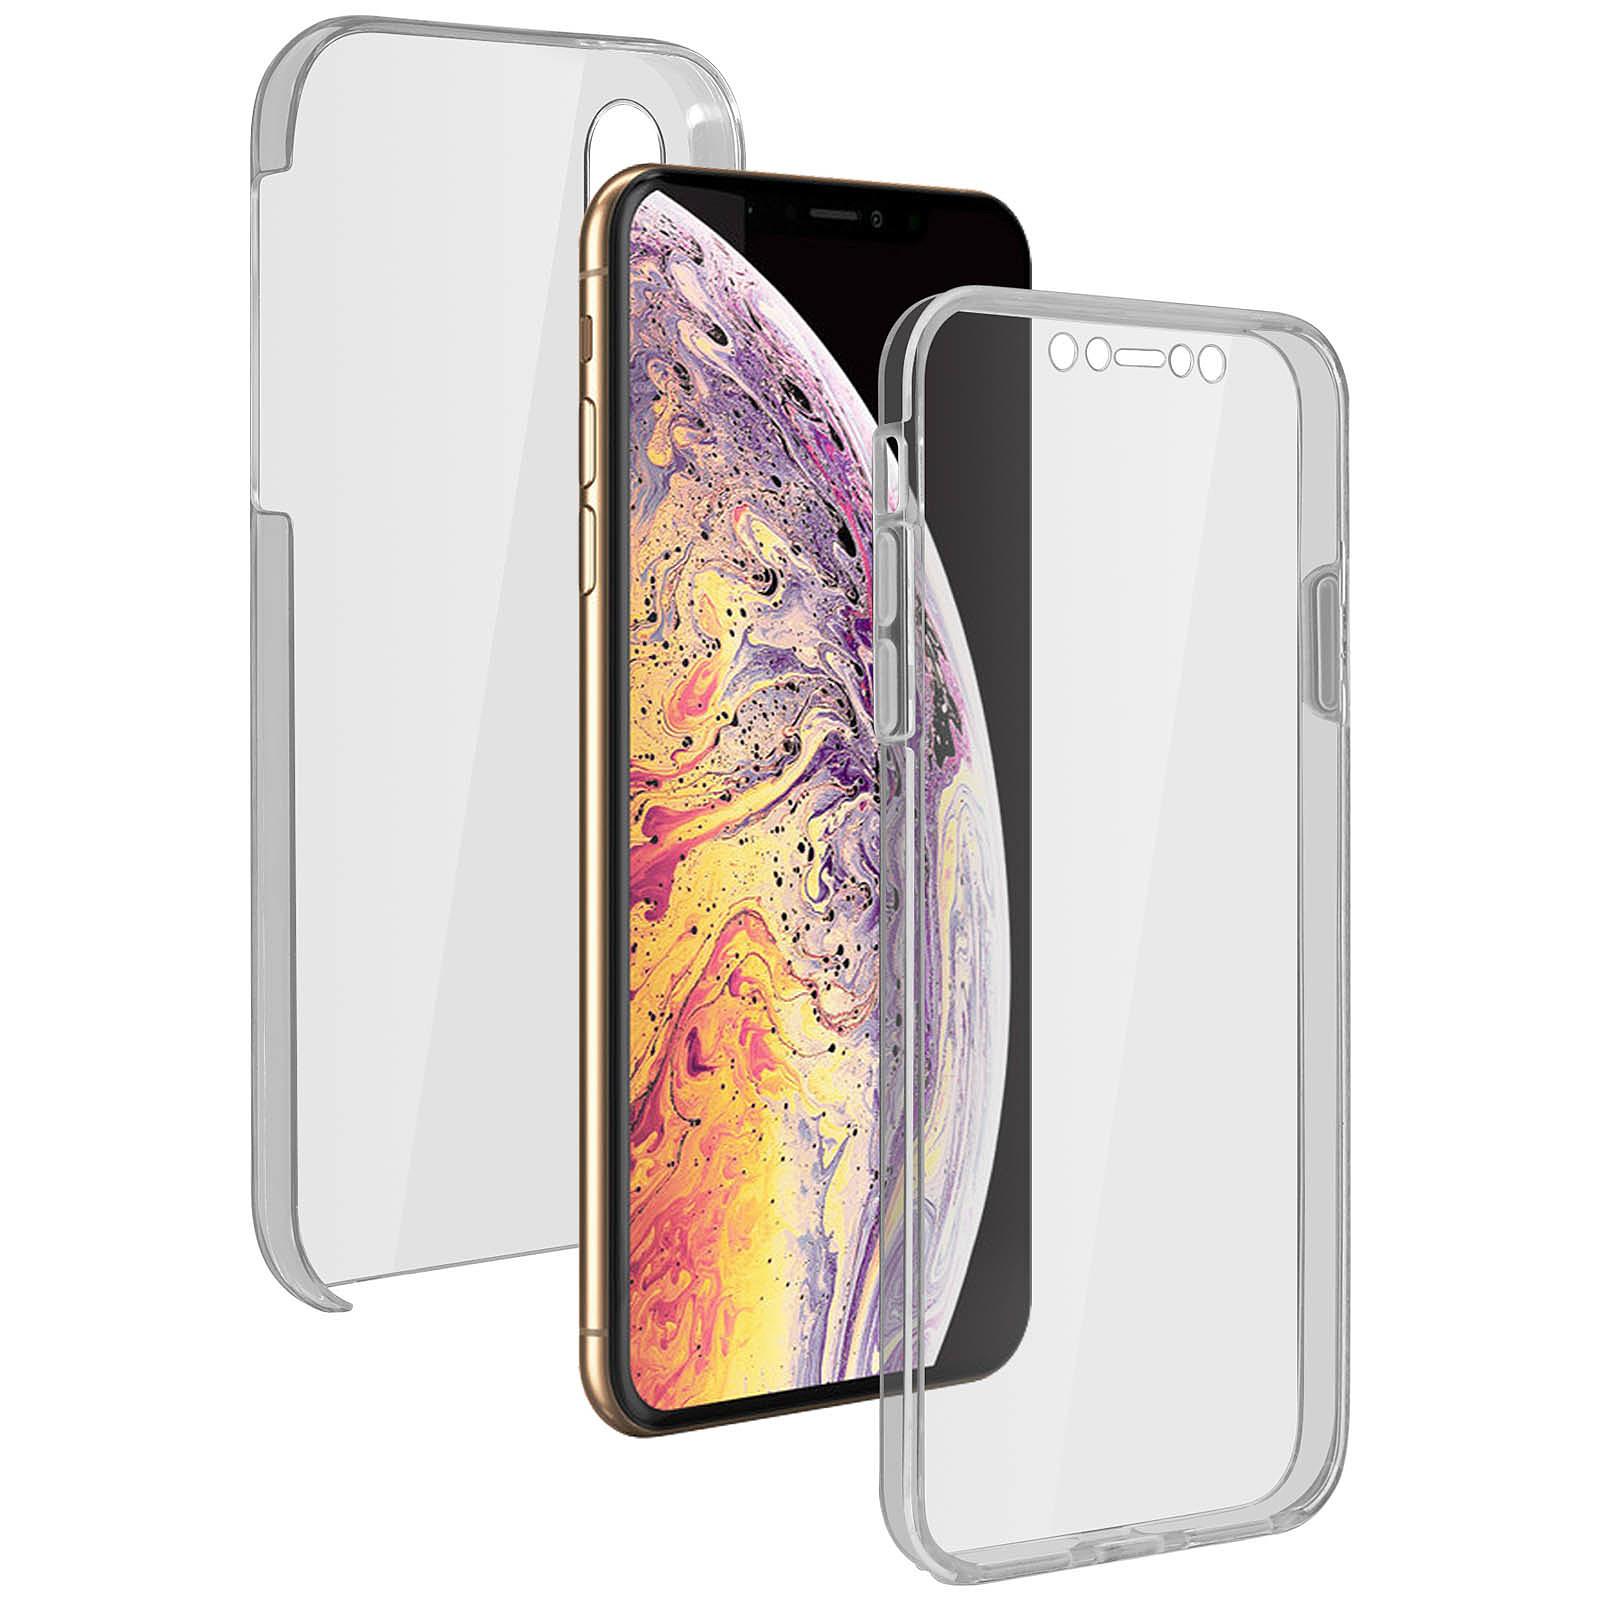 Avizar Coque Transparent pour Apple iPhone XS Max